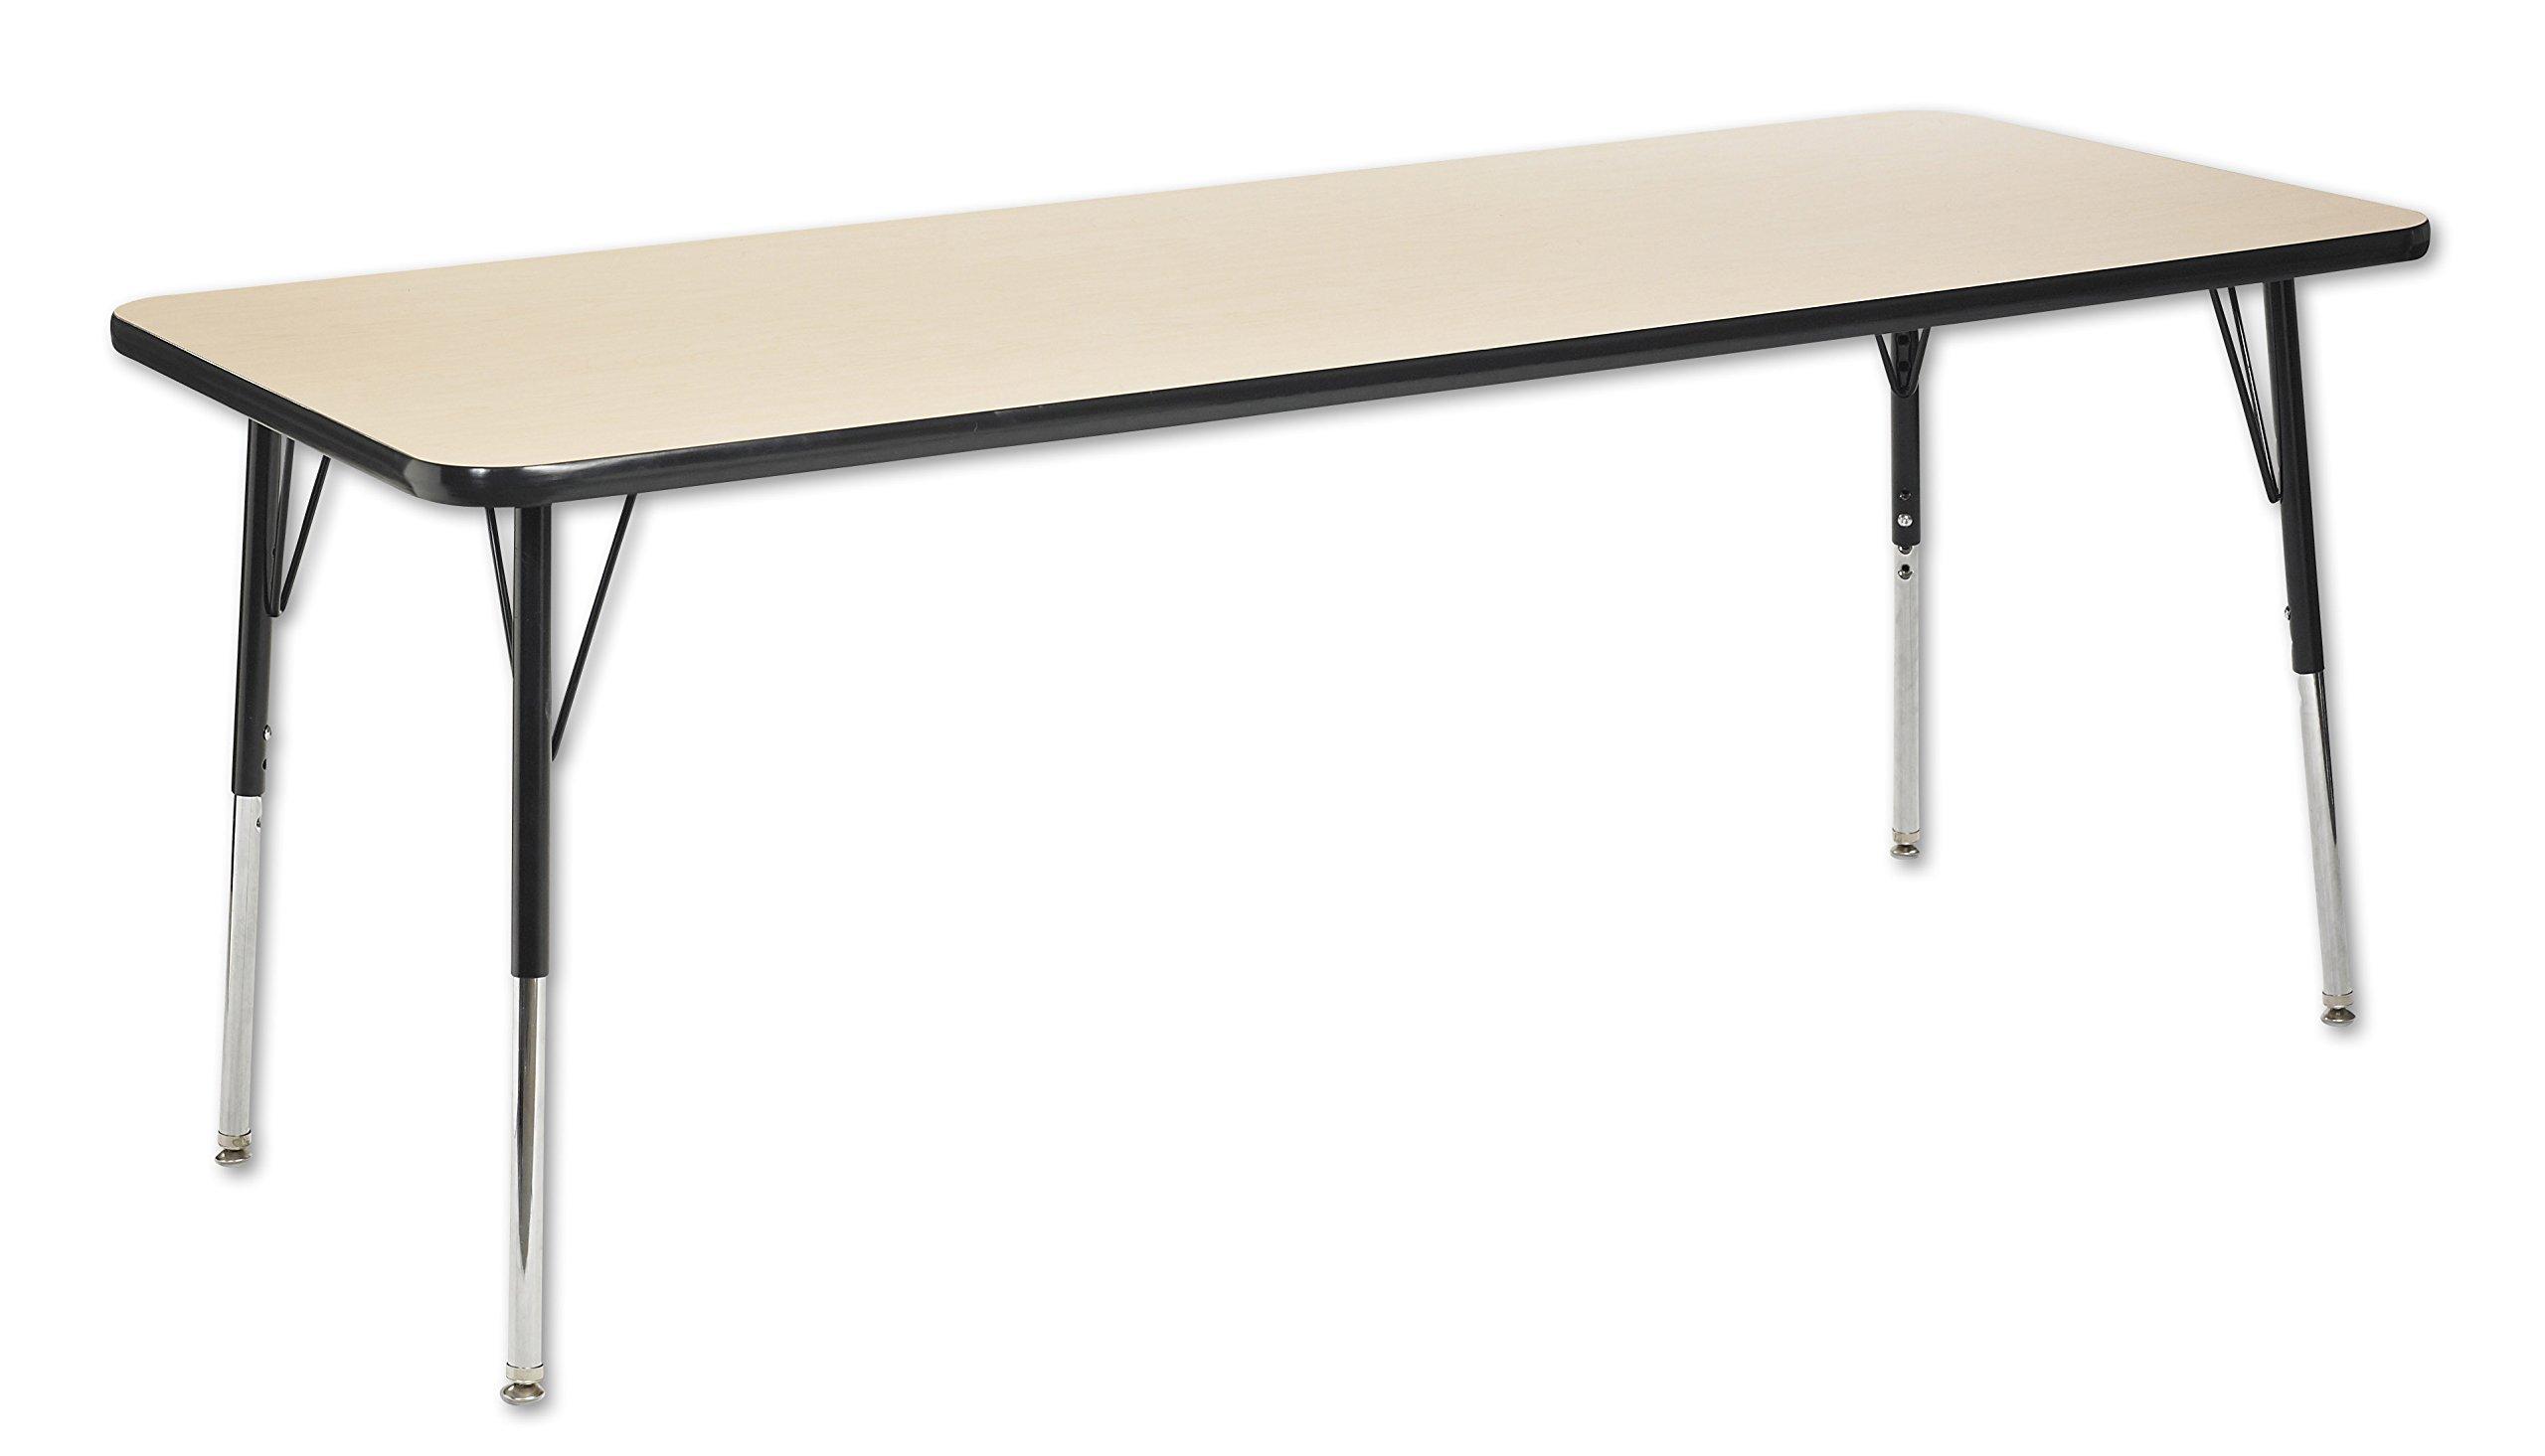 ECR4Kids T-Mold 30'' x 72'' Rectangular Activity School Table, Standard Legs w/ Swivel Glides, Adjustable Height 19-30 inch (Maple/Black)